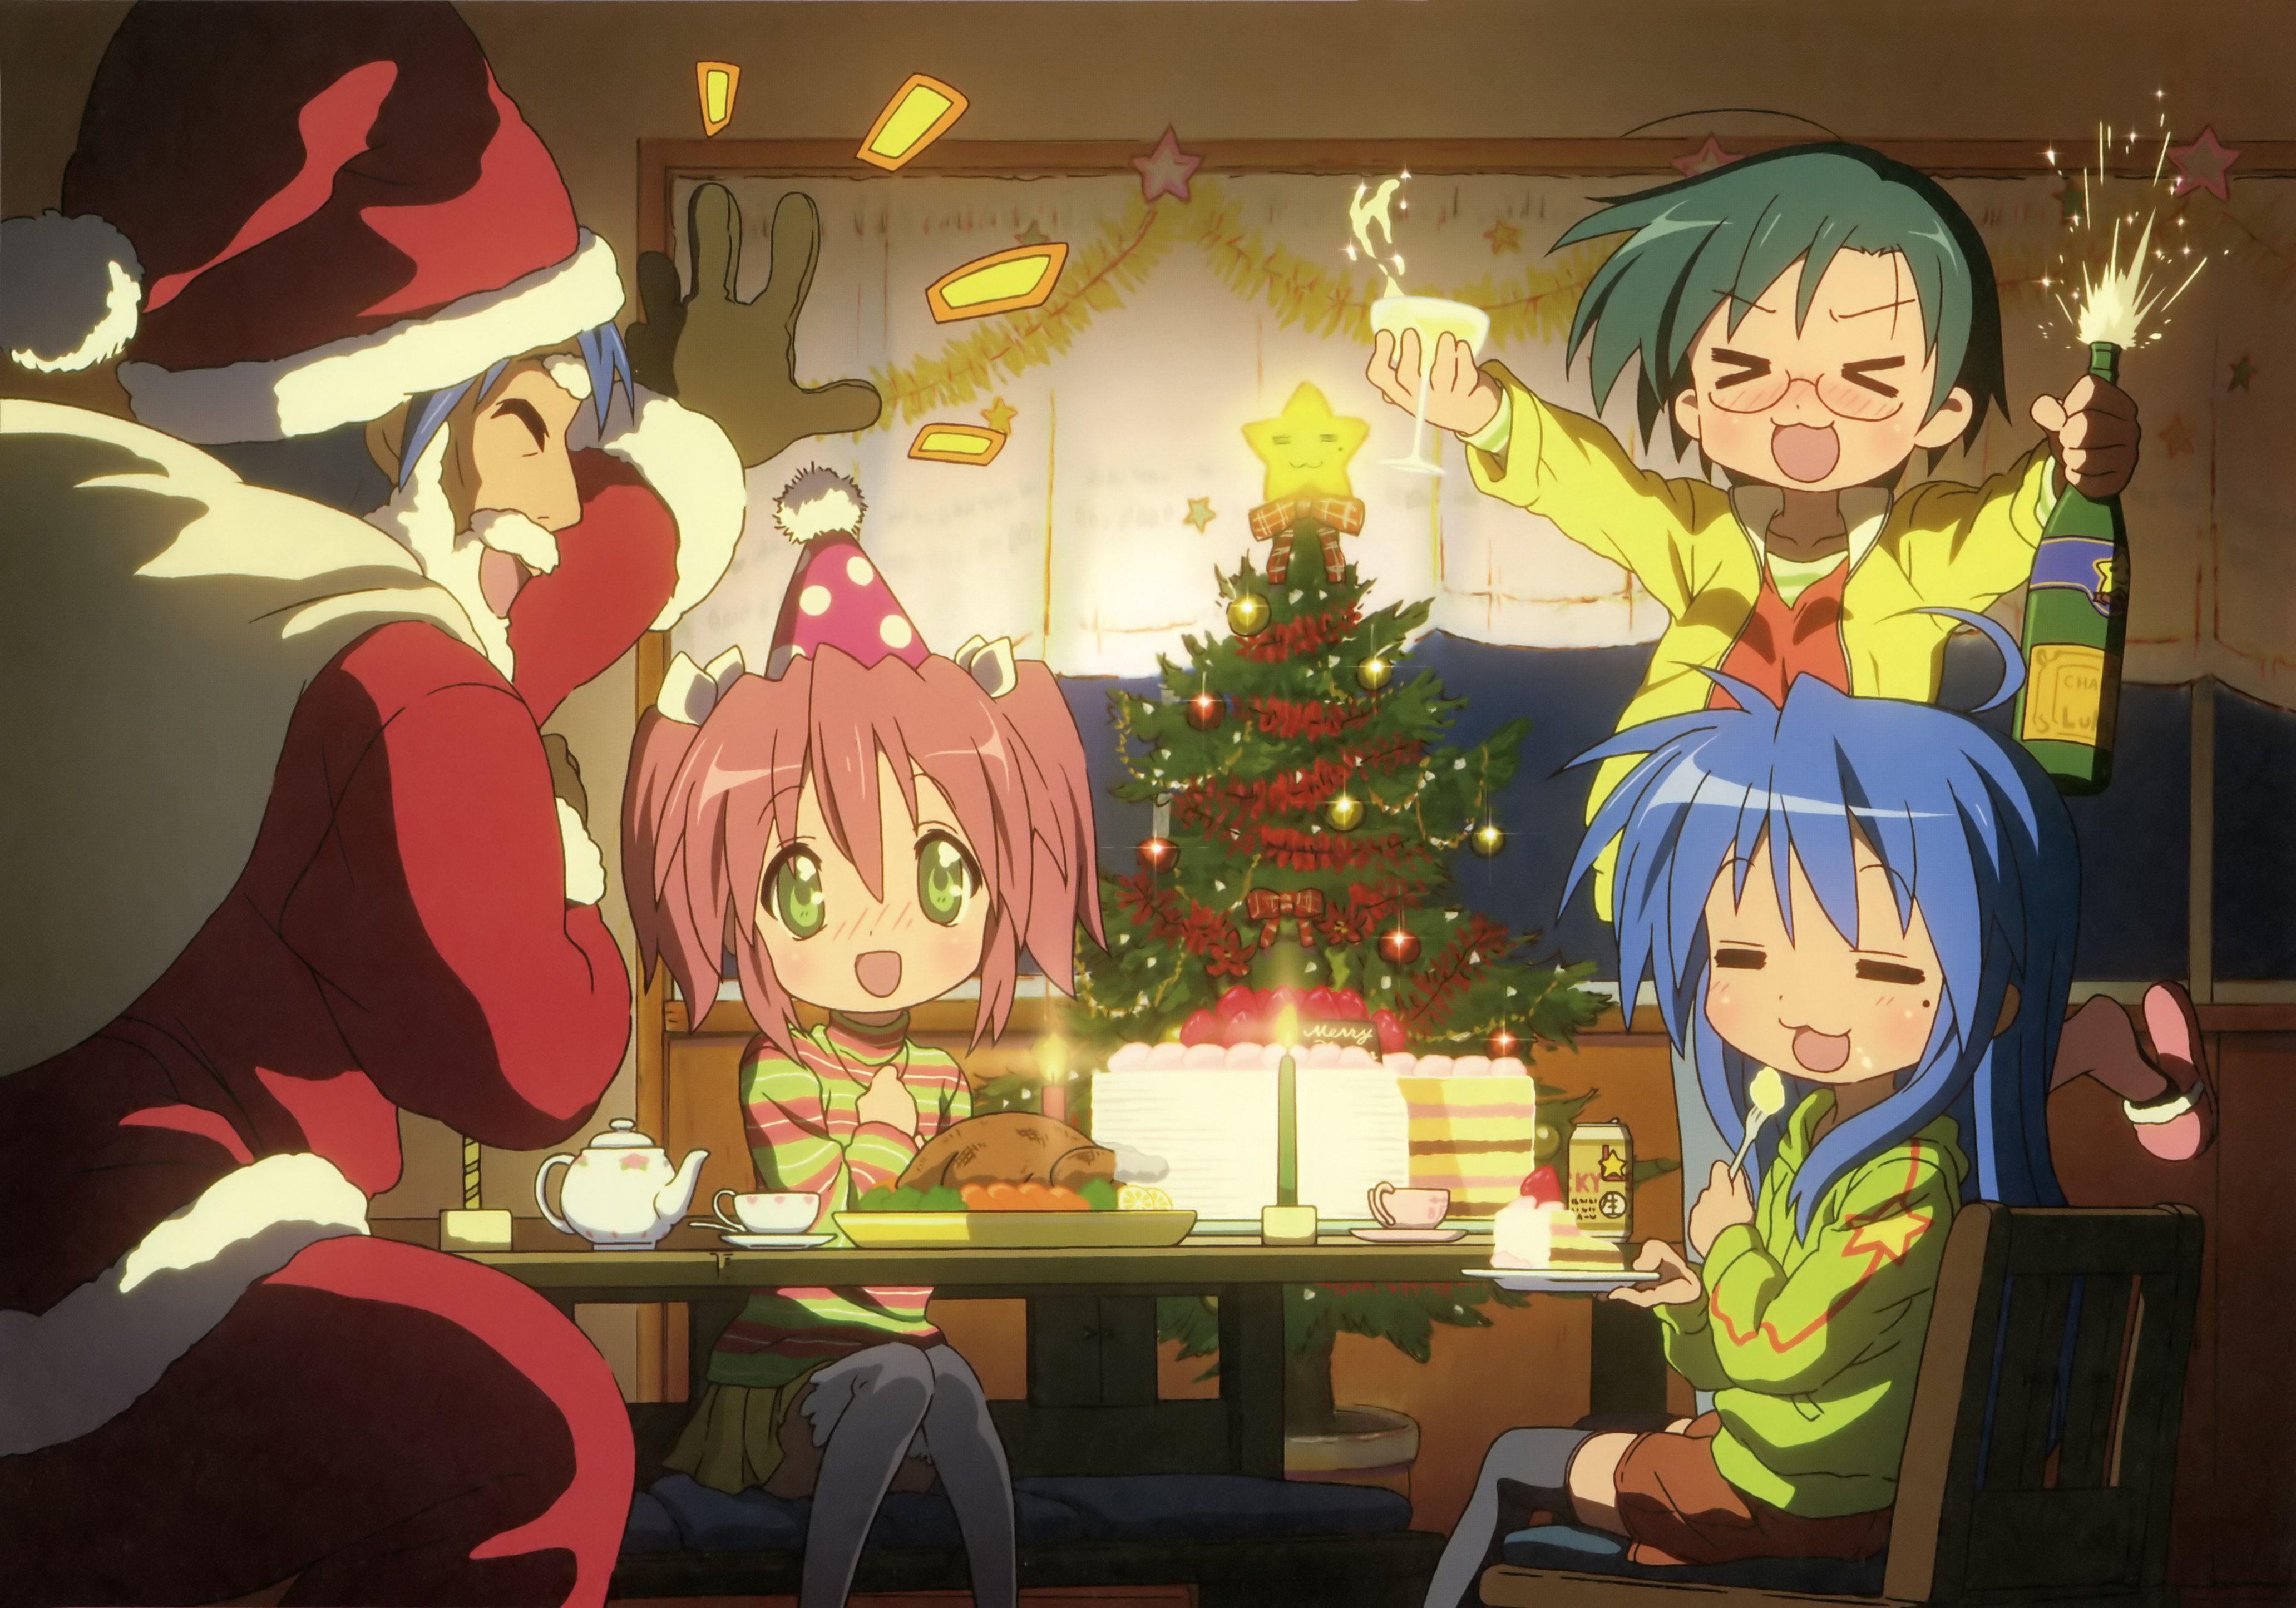 Anime Lucky Star Christmas Wallpaper Anime Christmas Anime Christmas Wallpaper Christmas Anime Wallpaper Cute anime christmas wallpaper